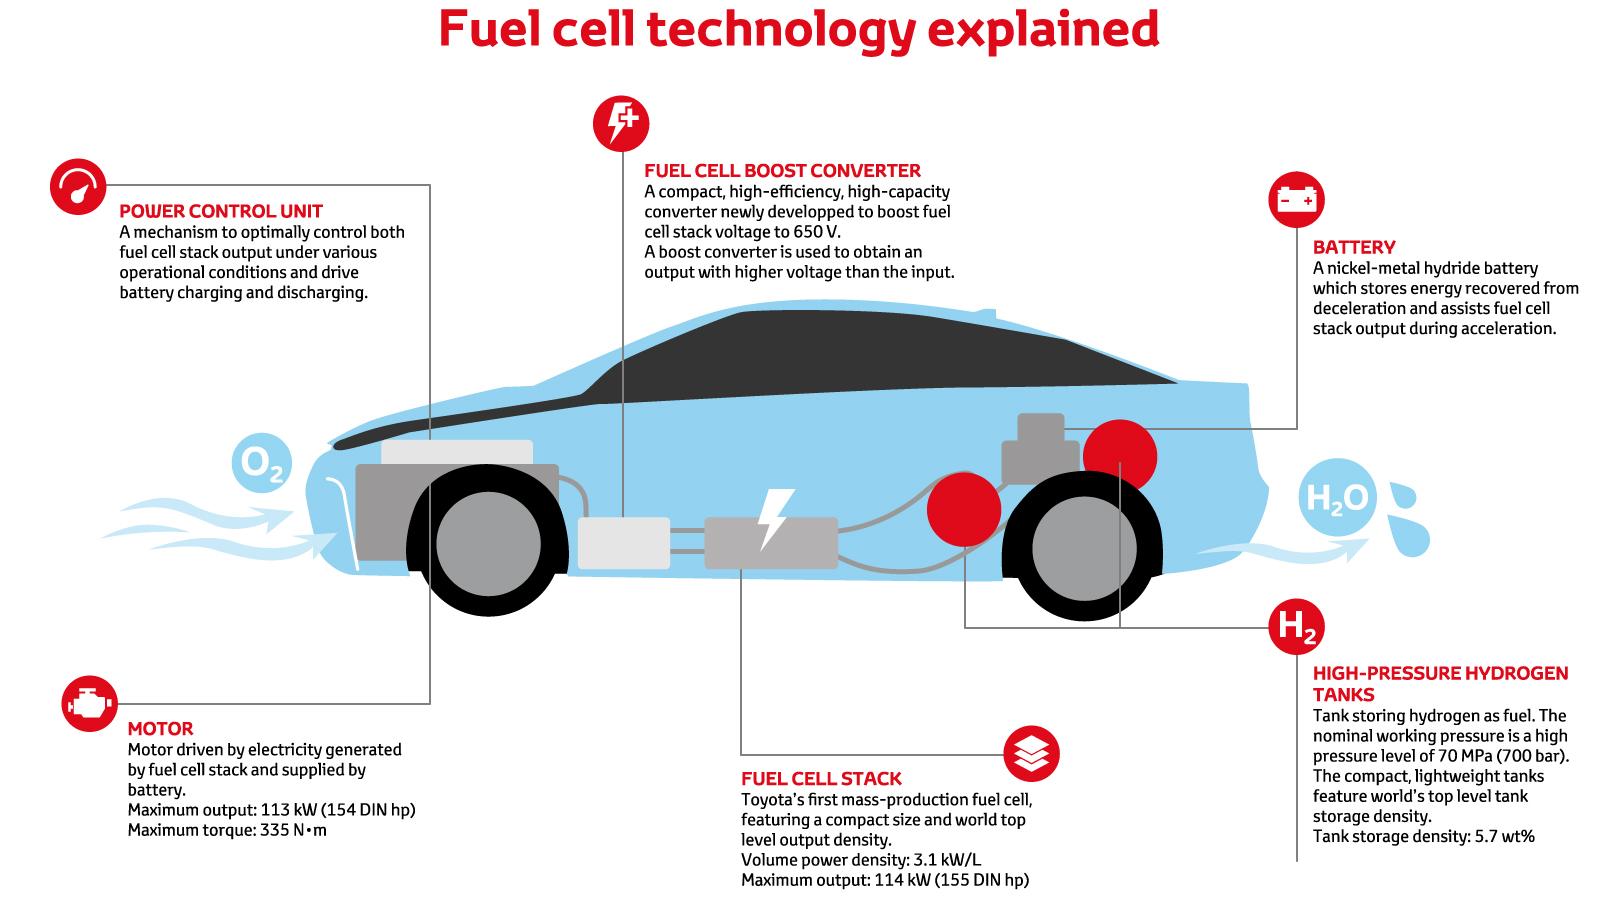 Home Fuel Cell Power Unit Notch Filter Circuit Diagram Mc33171